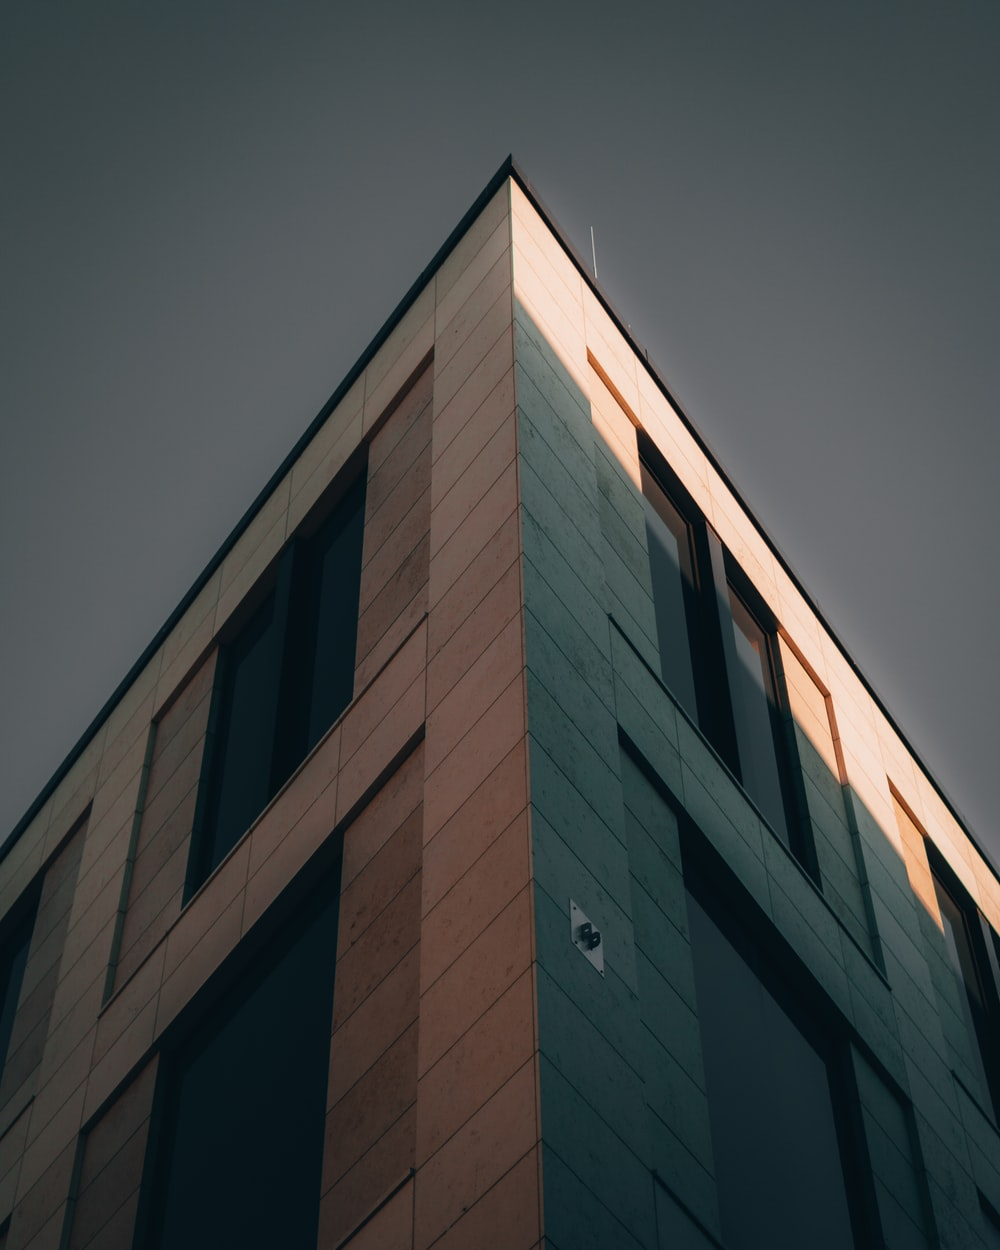 brown concrete building under gray sky